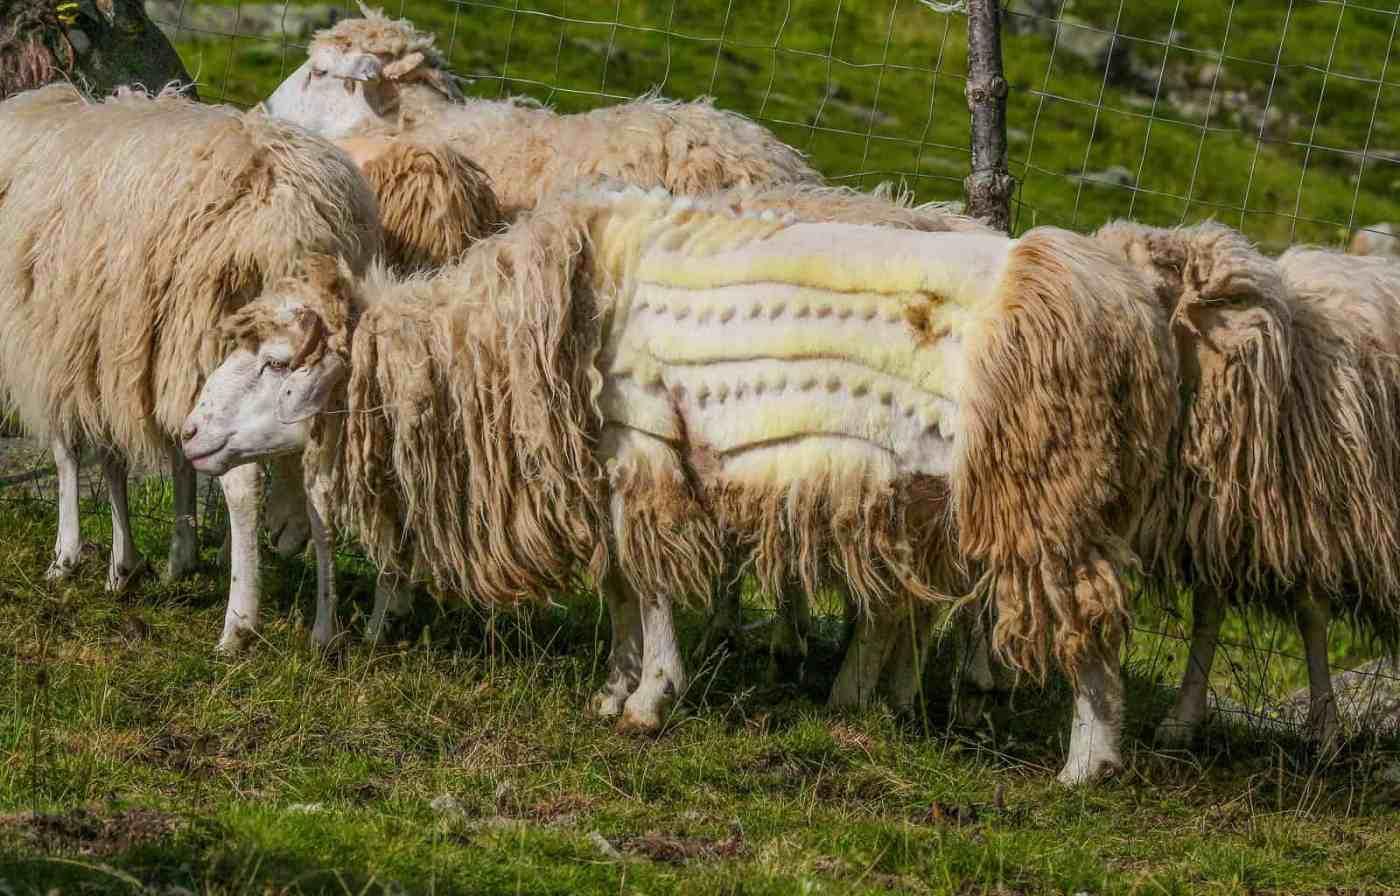 Albania, Cutting hair of the sheeps can be an art_.jpg - © European Wilderness Society CC BY-NC-ND 4.0